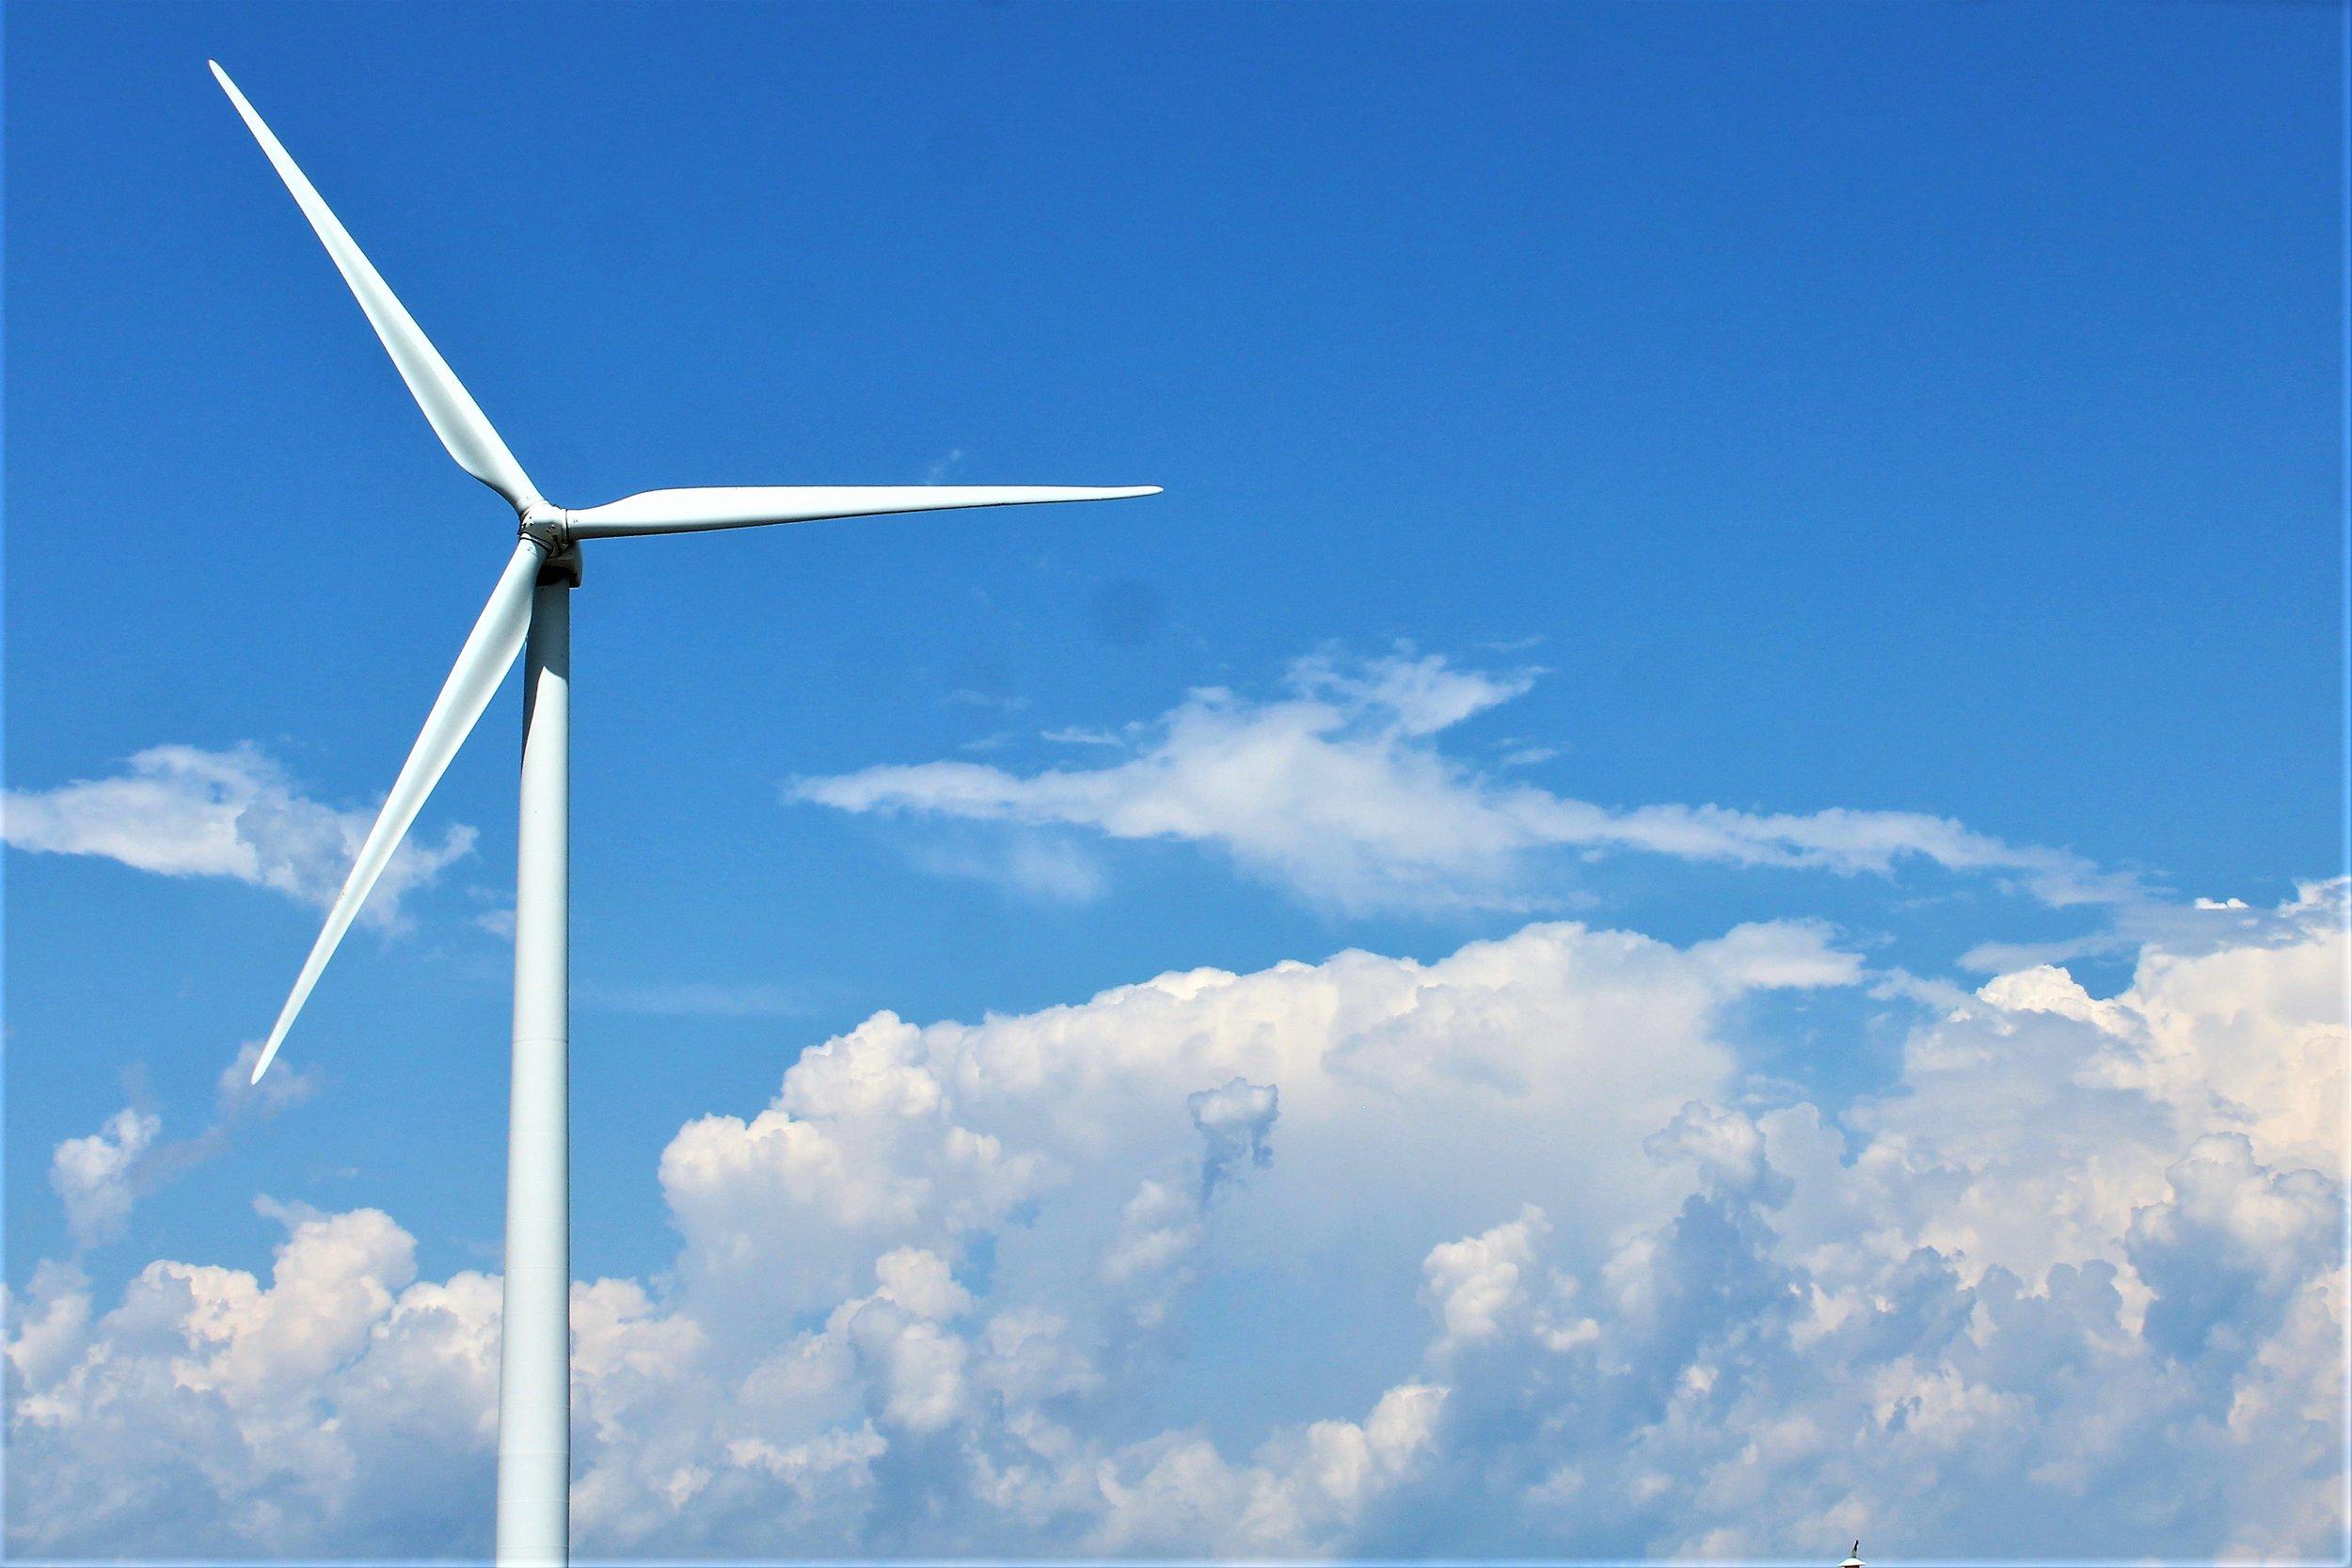 ACUA windmill - Photo by Bill Barlow